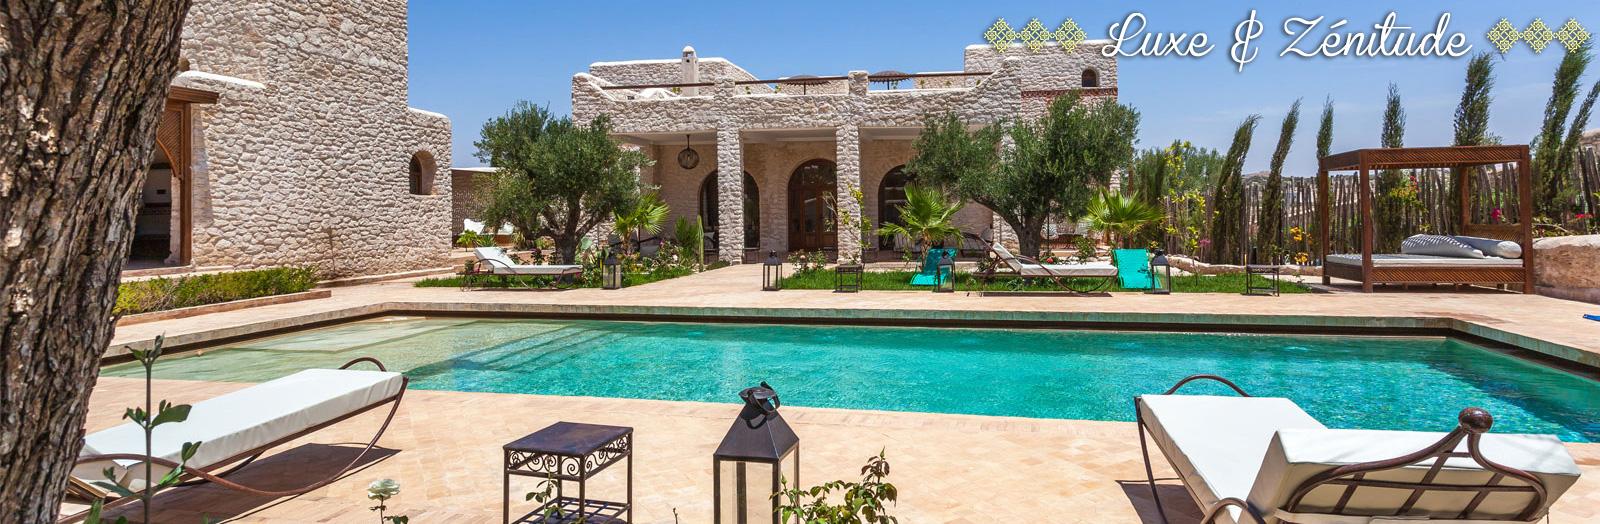 Bienvenue riad dharma essaouira riad dharma essaouira for Les jardins de la villa maroc essaouira